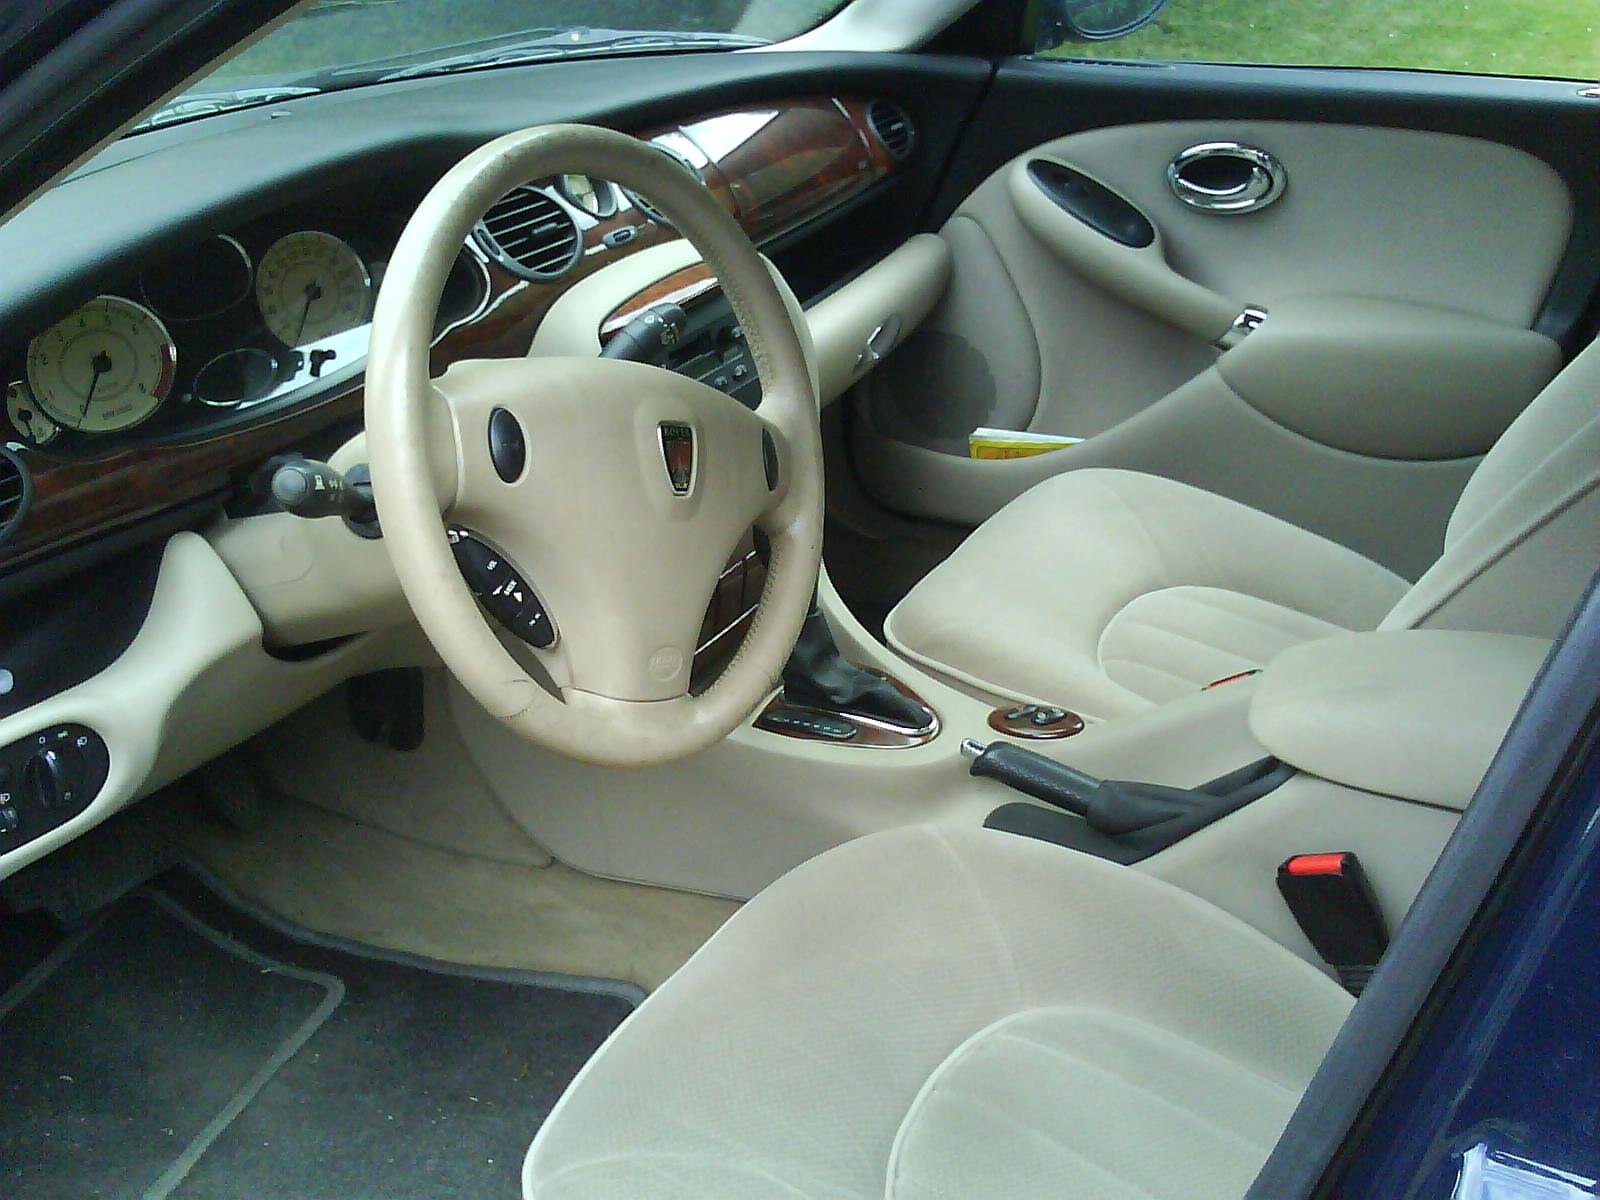 VENTE] - Rover 75 1.8 Pack